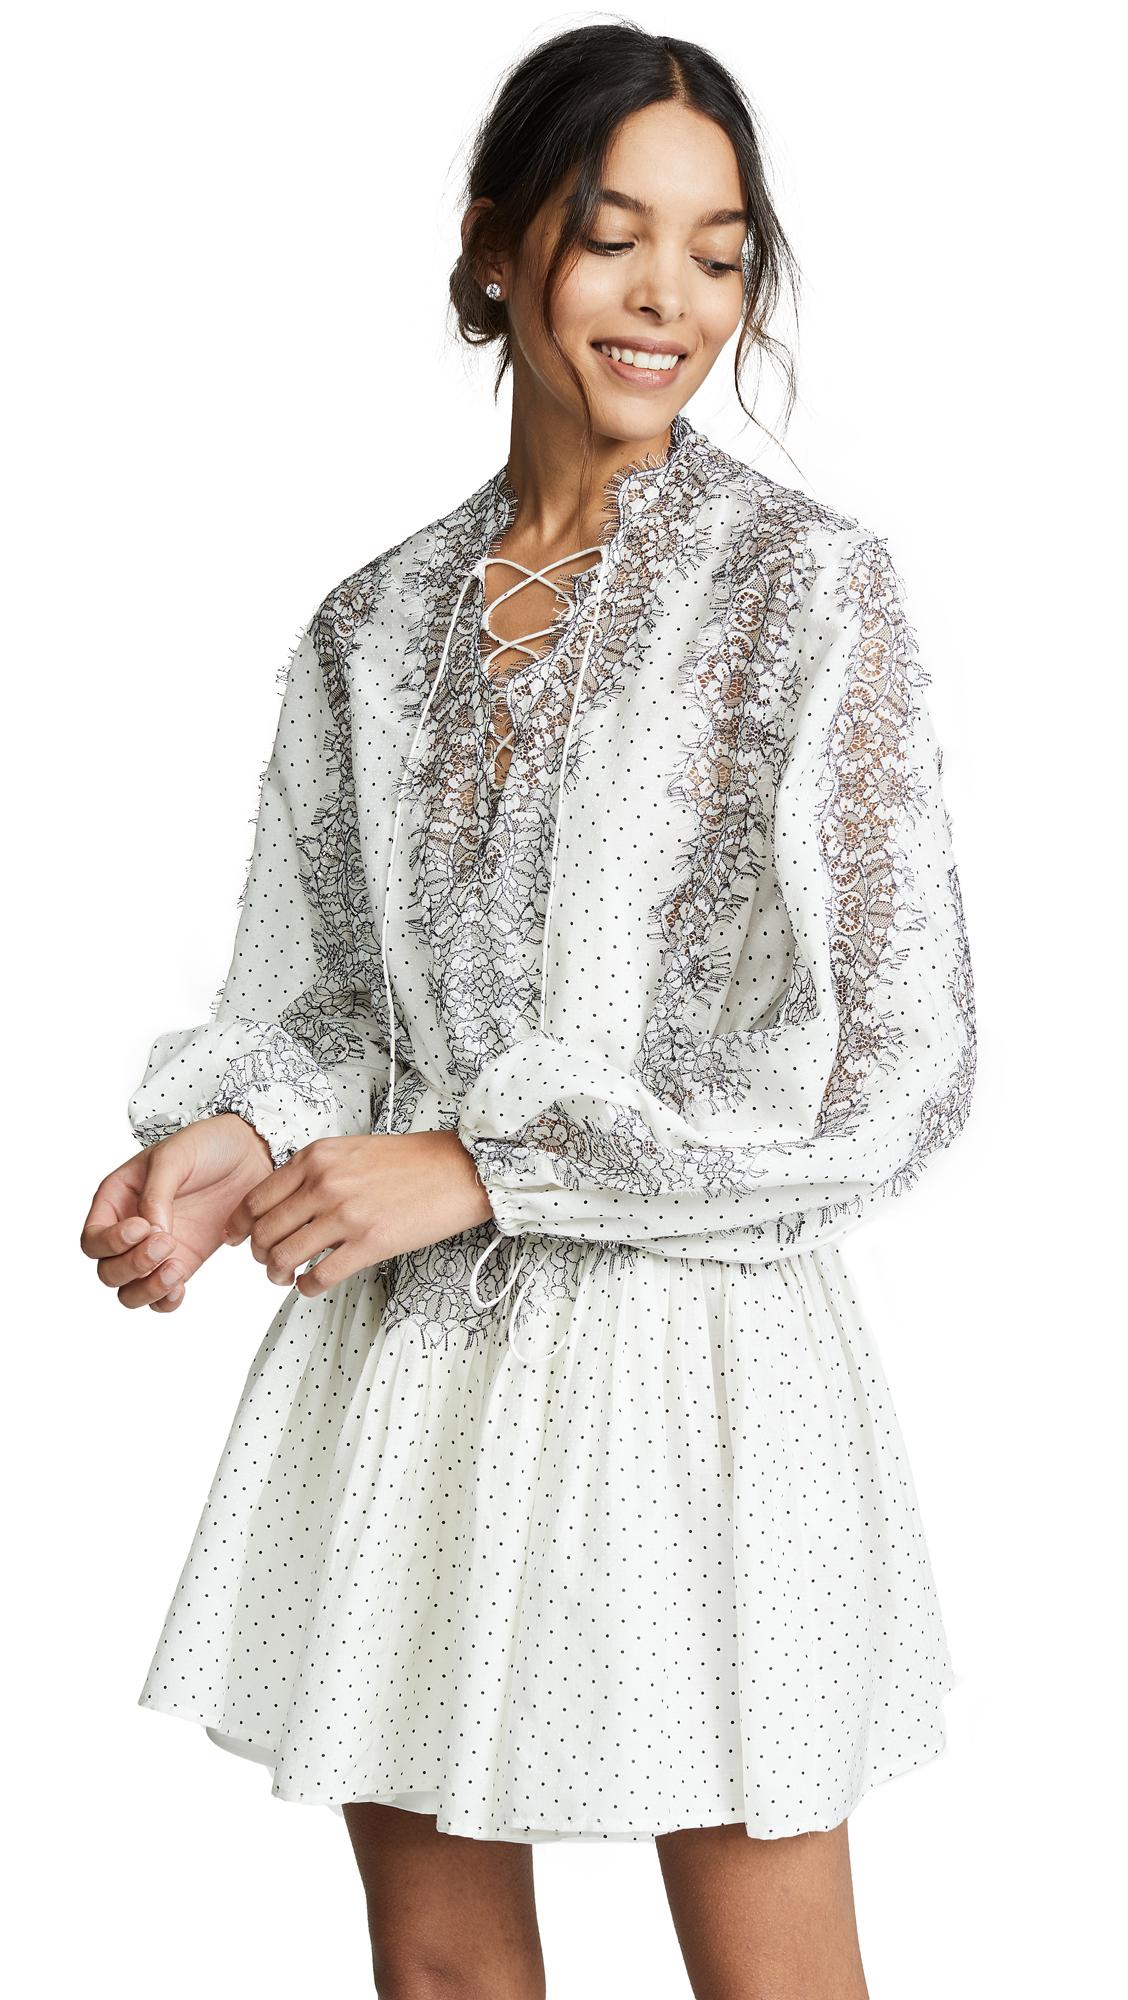 ACLER Avery Dress in Polka Ivory